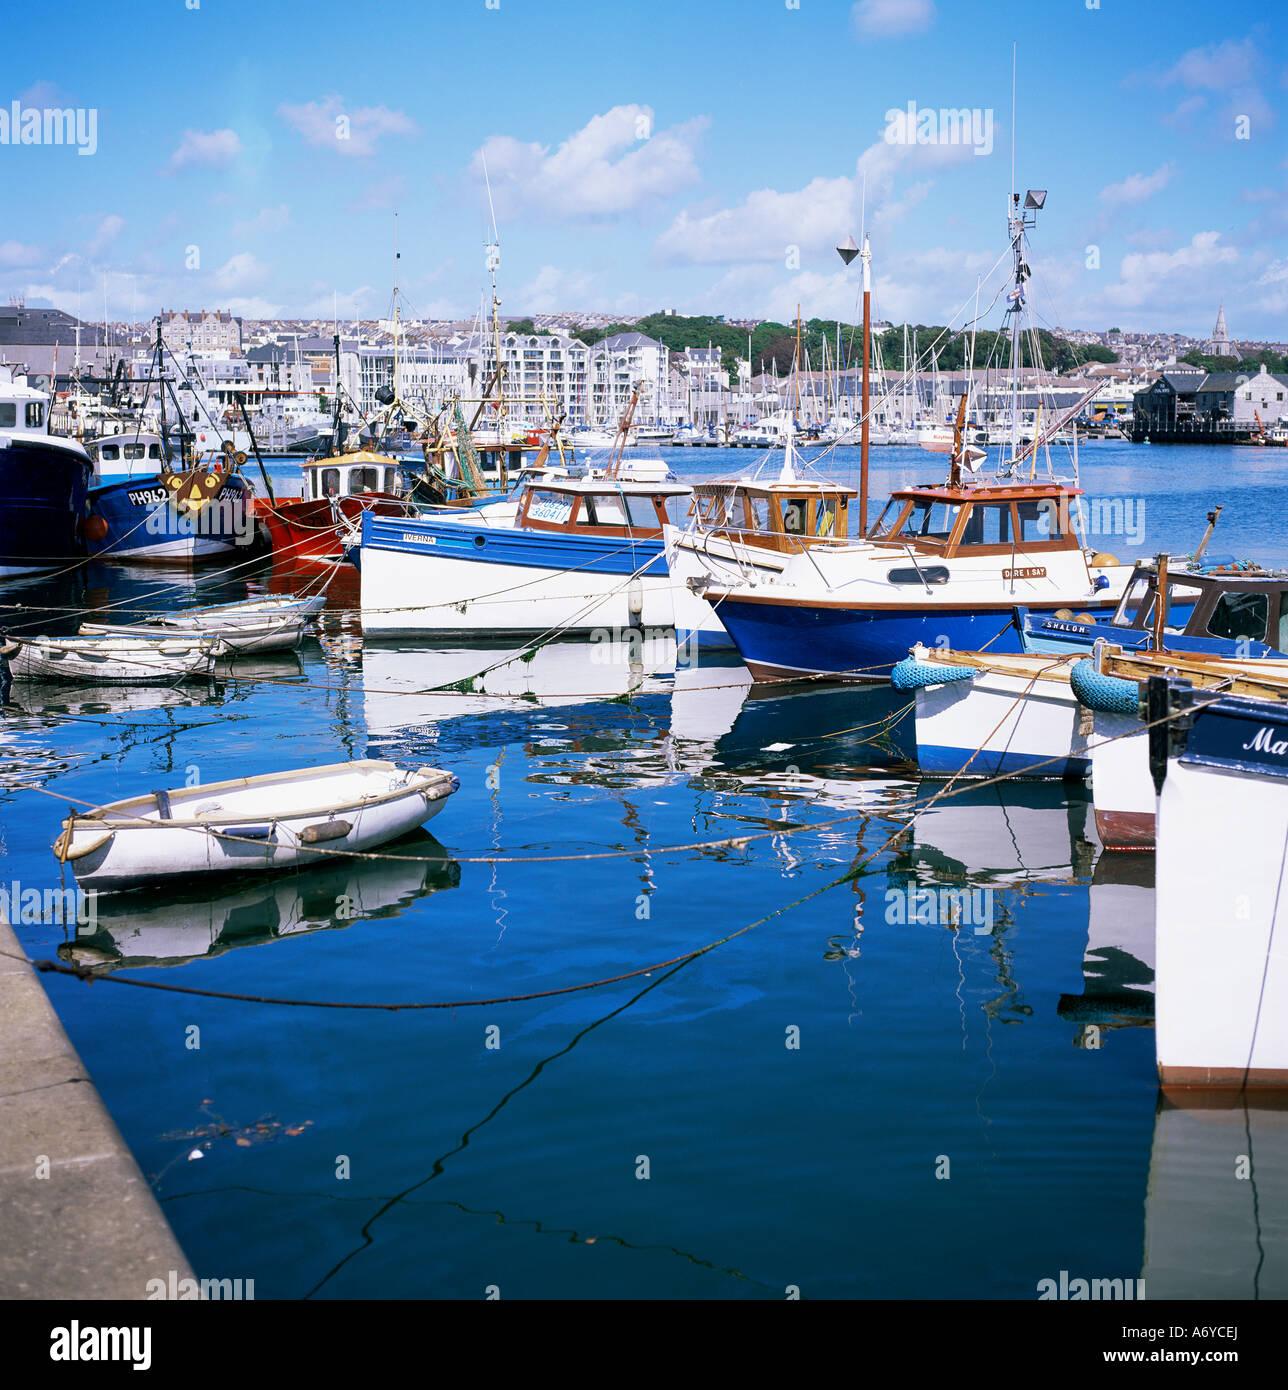 barbican-plymouth-devon-england-united-k